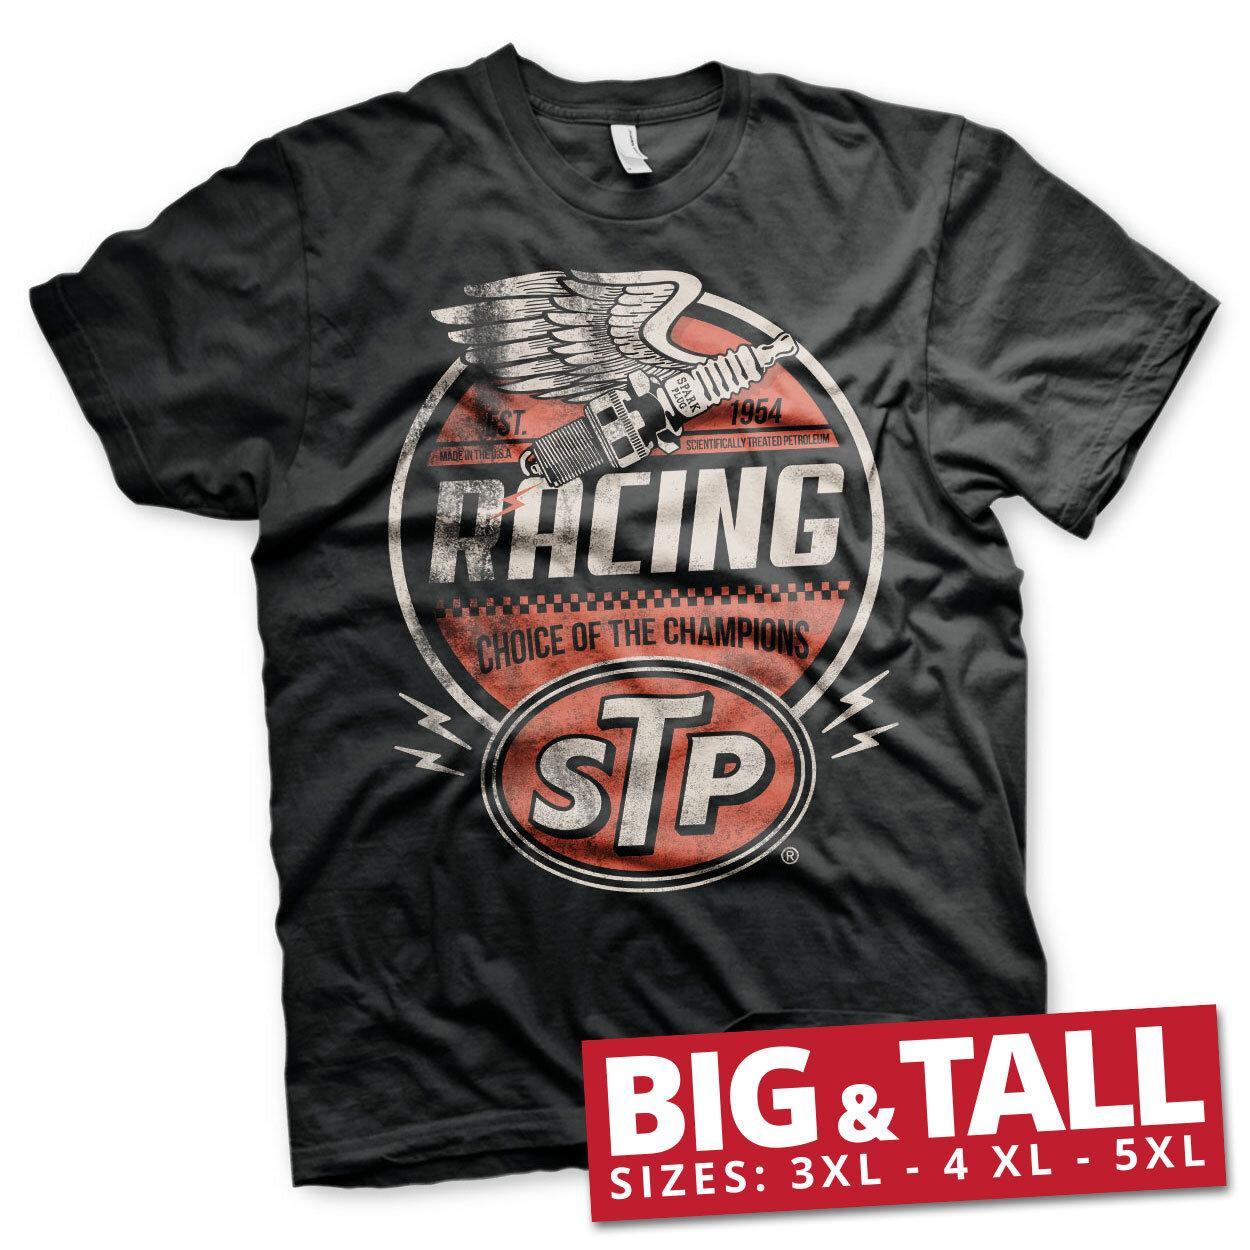 STP Vintage Racing Big & Tall T-Shirt